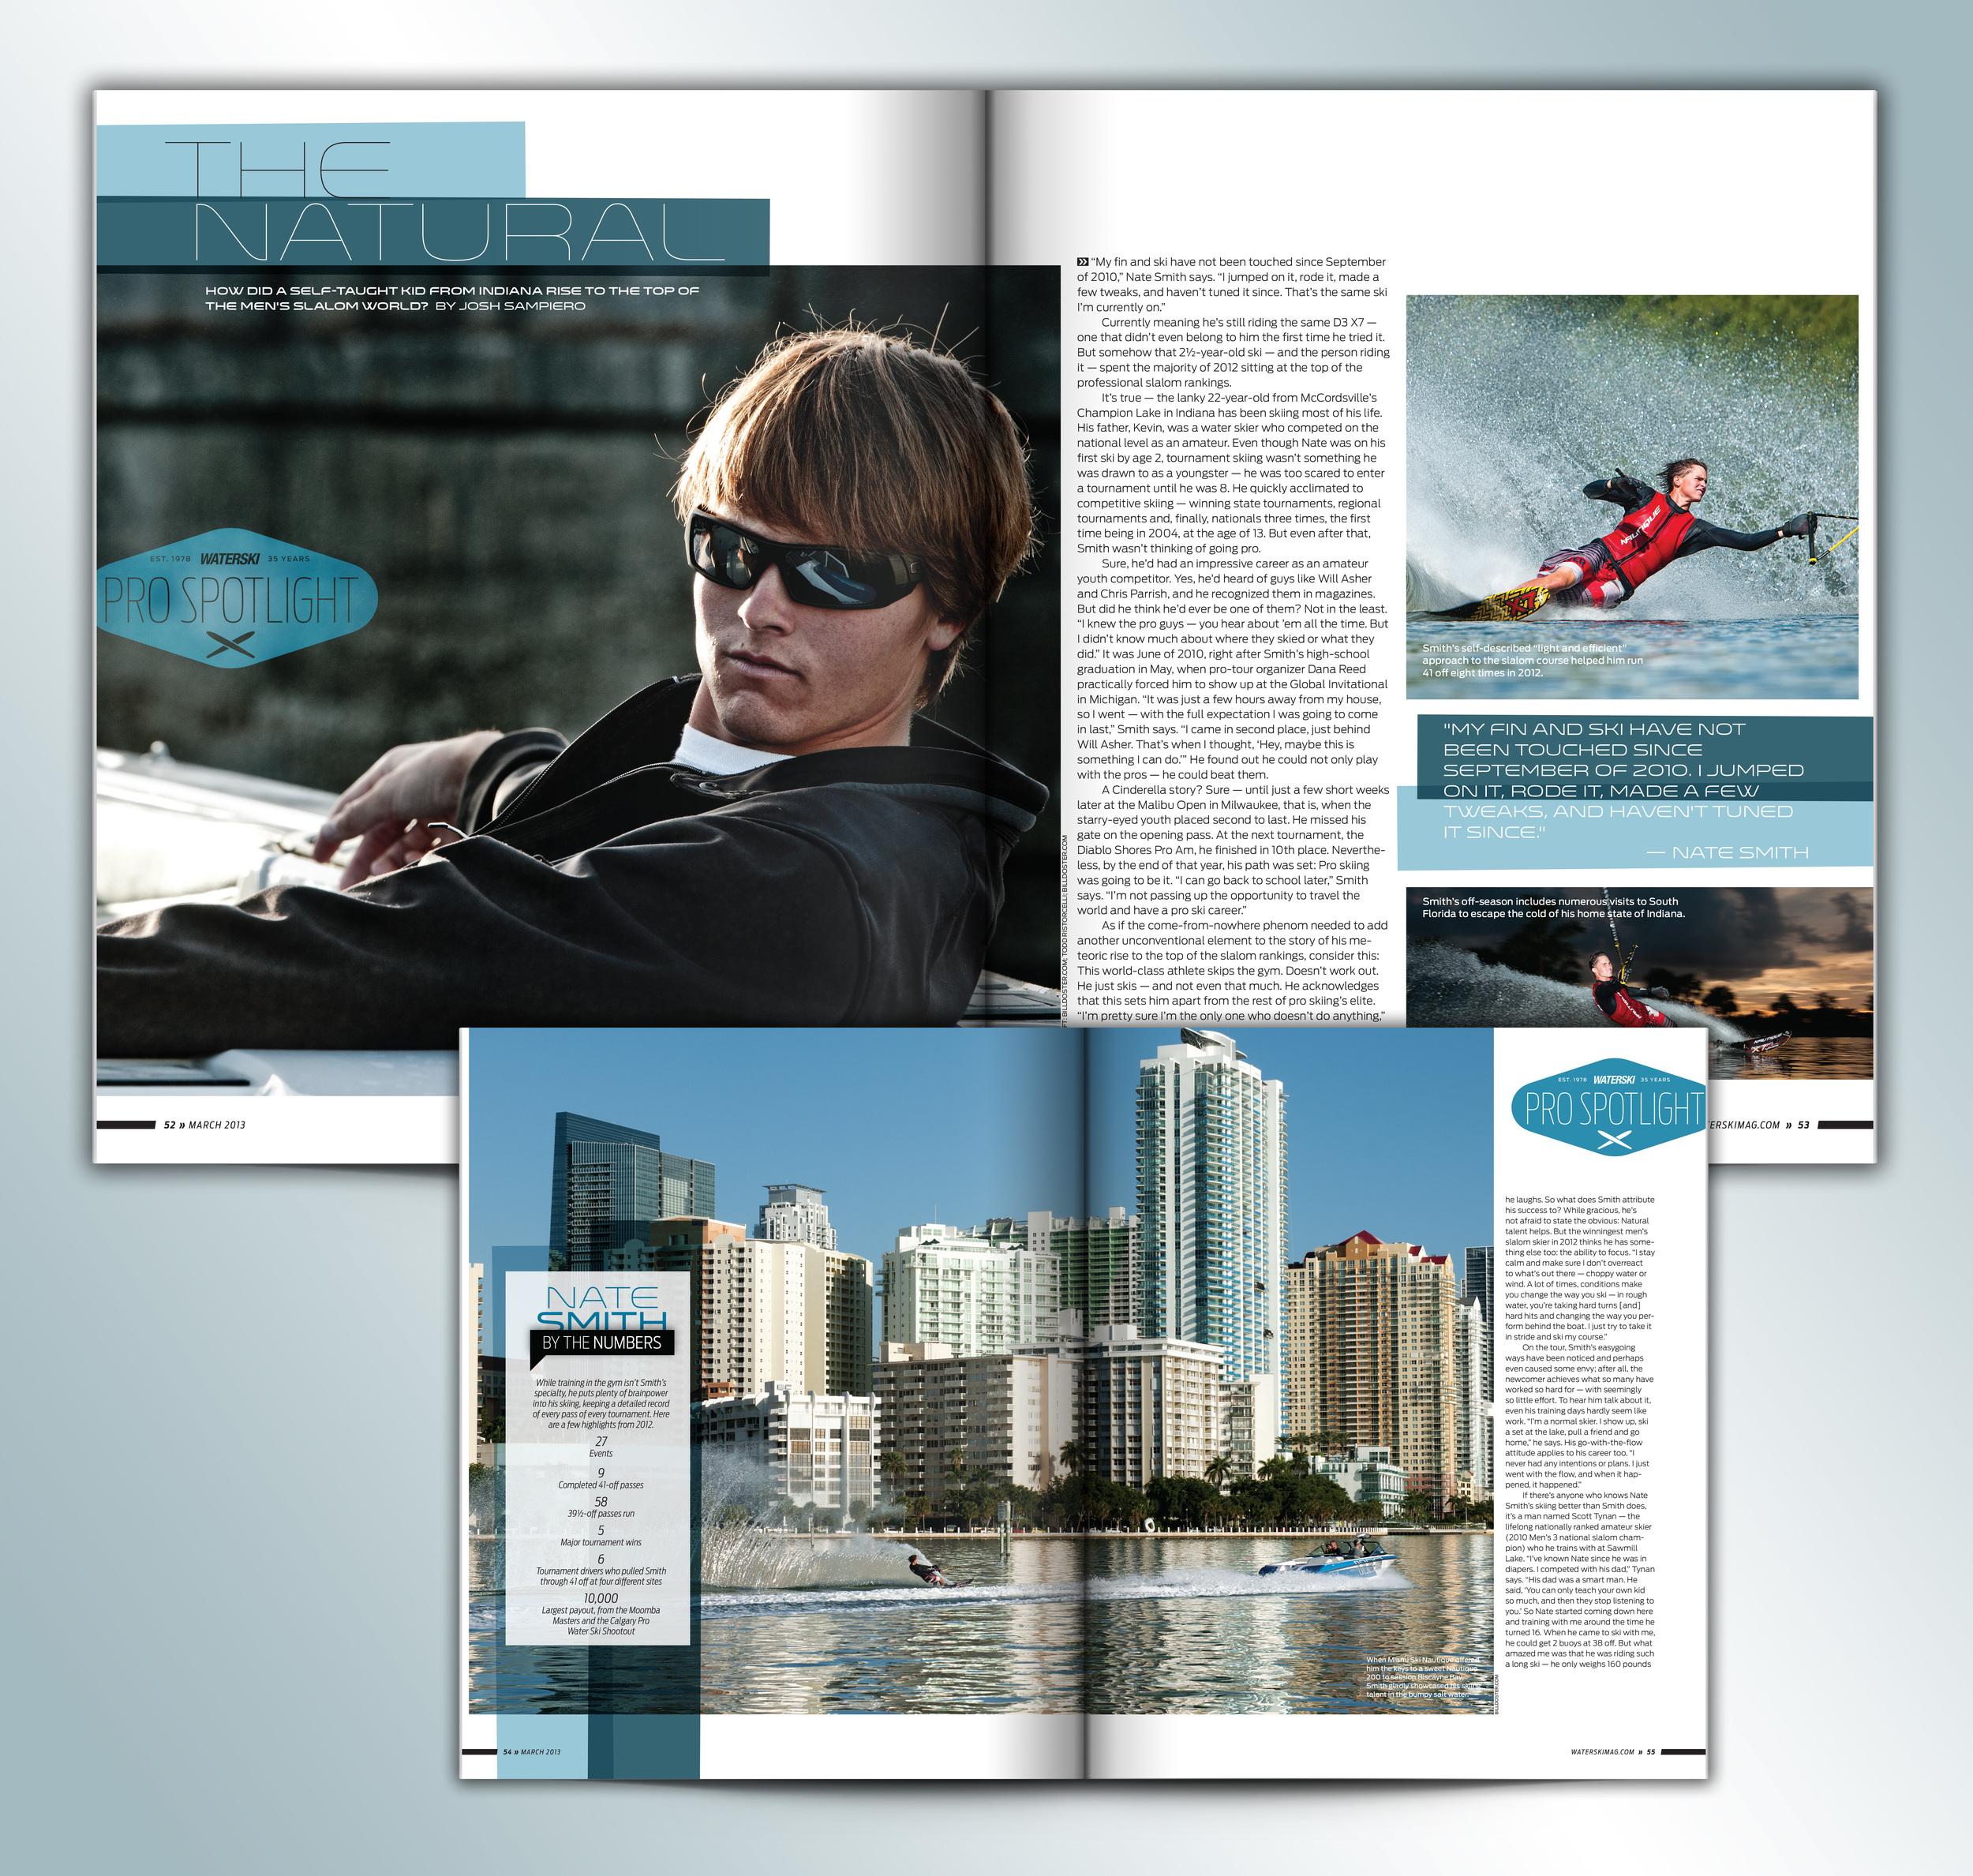 Waterski_Magazine_pages_layout_1.jpg